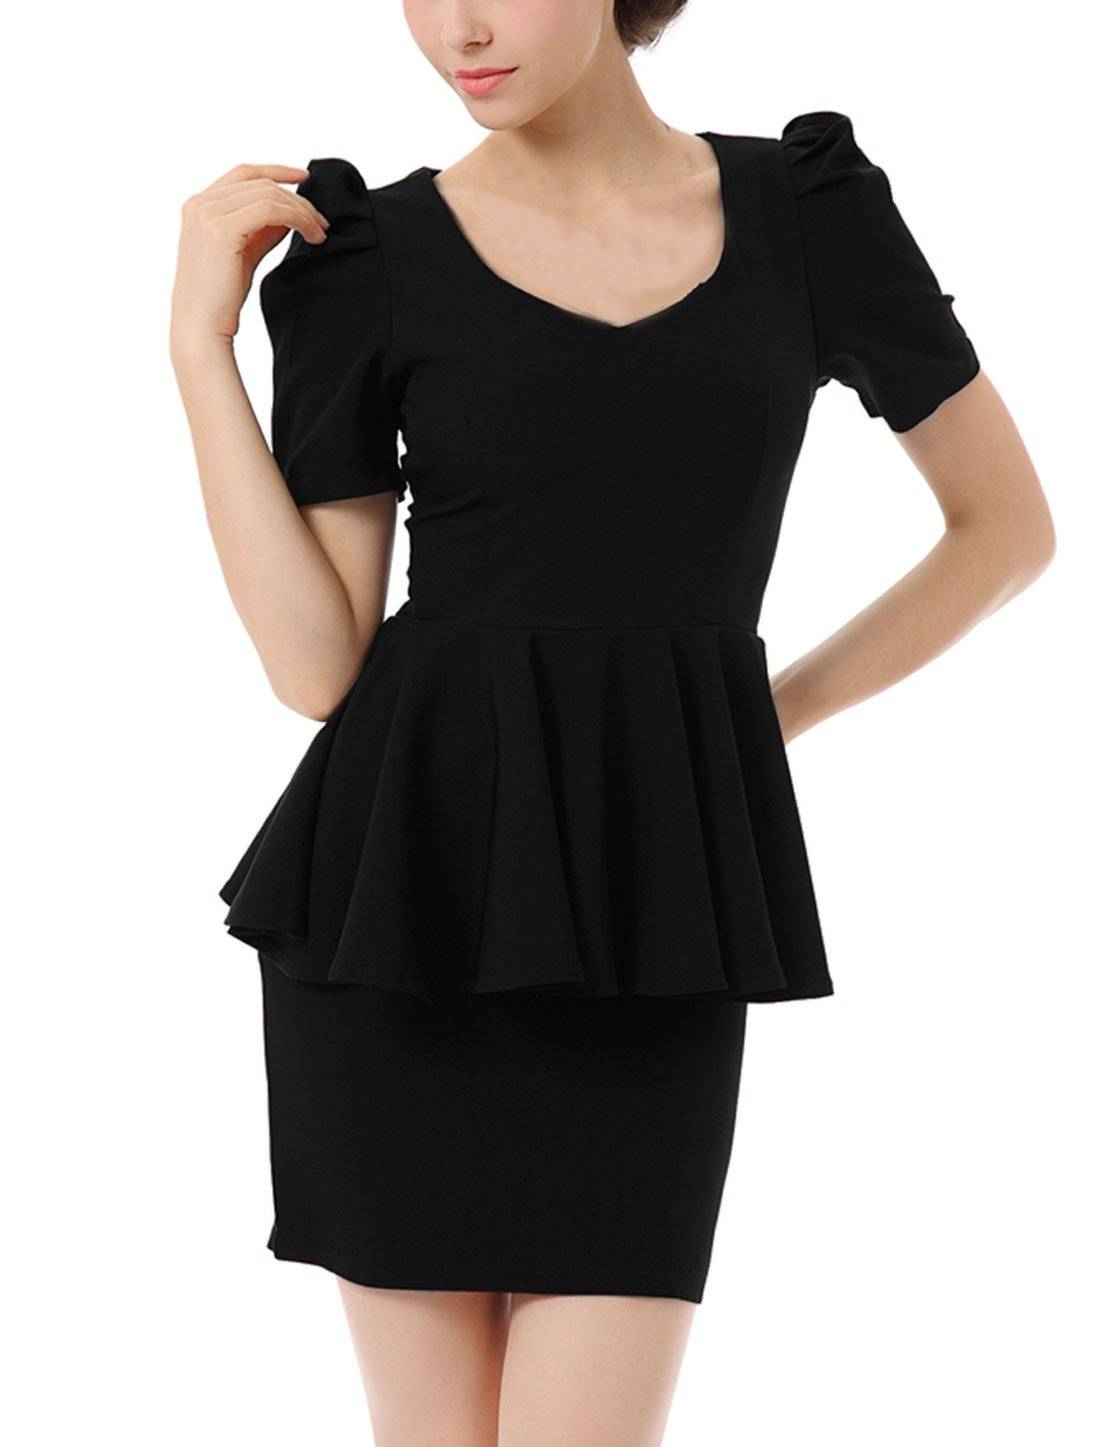 Allegra K Lady Peplum-style Frill Slim Trim Slim Fit Dress Black M